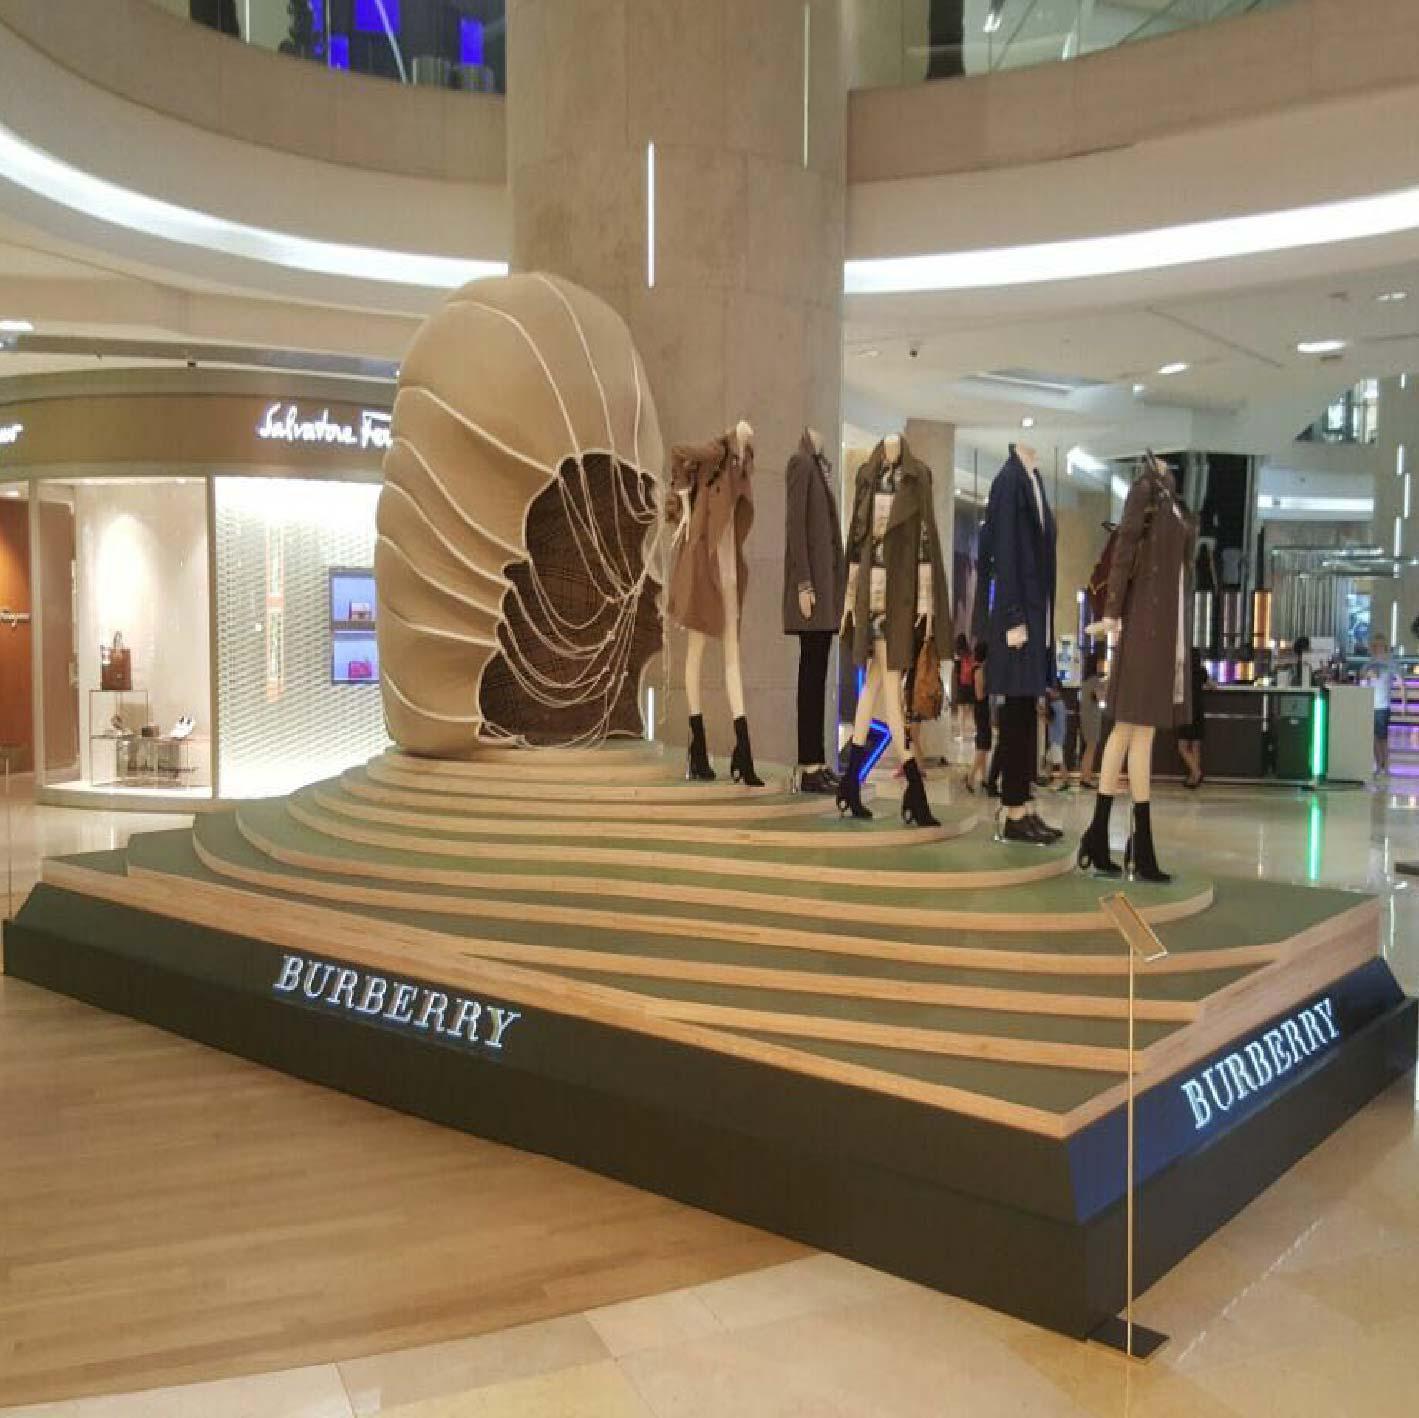 Burberry Fashion Display